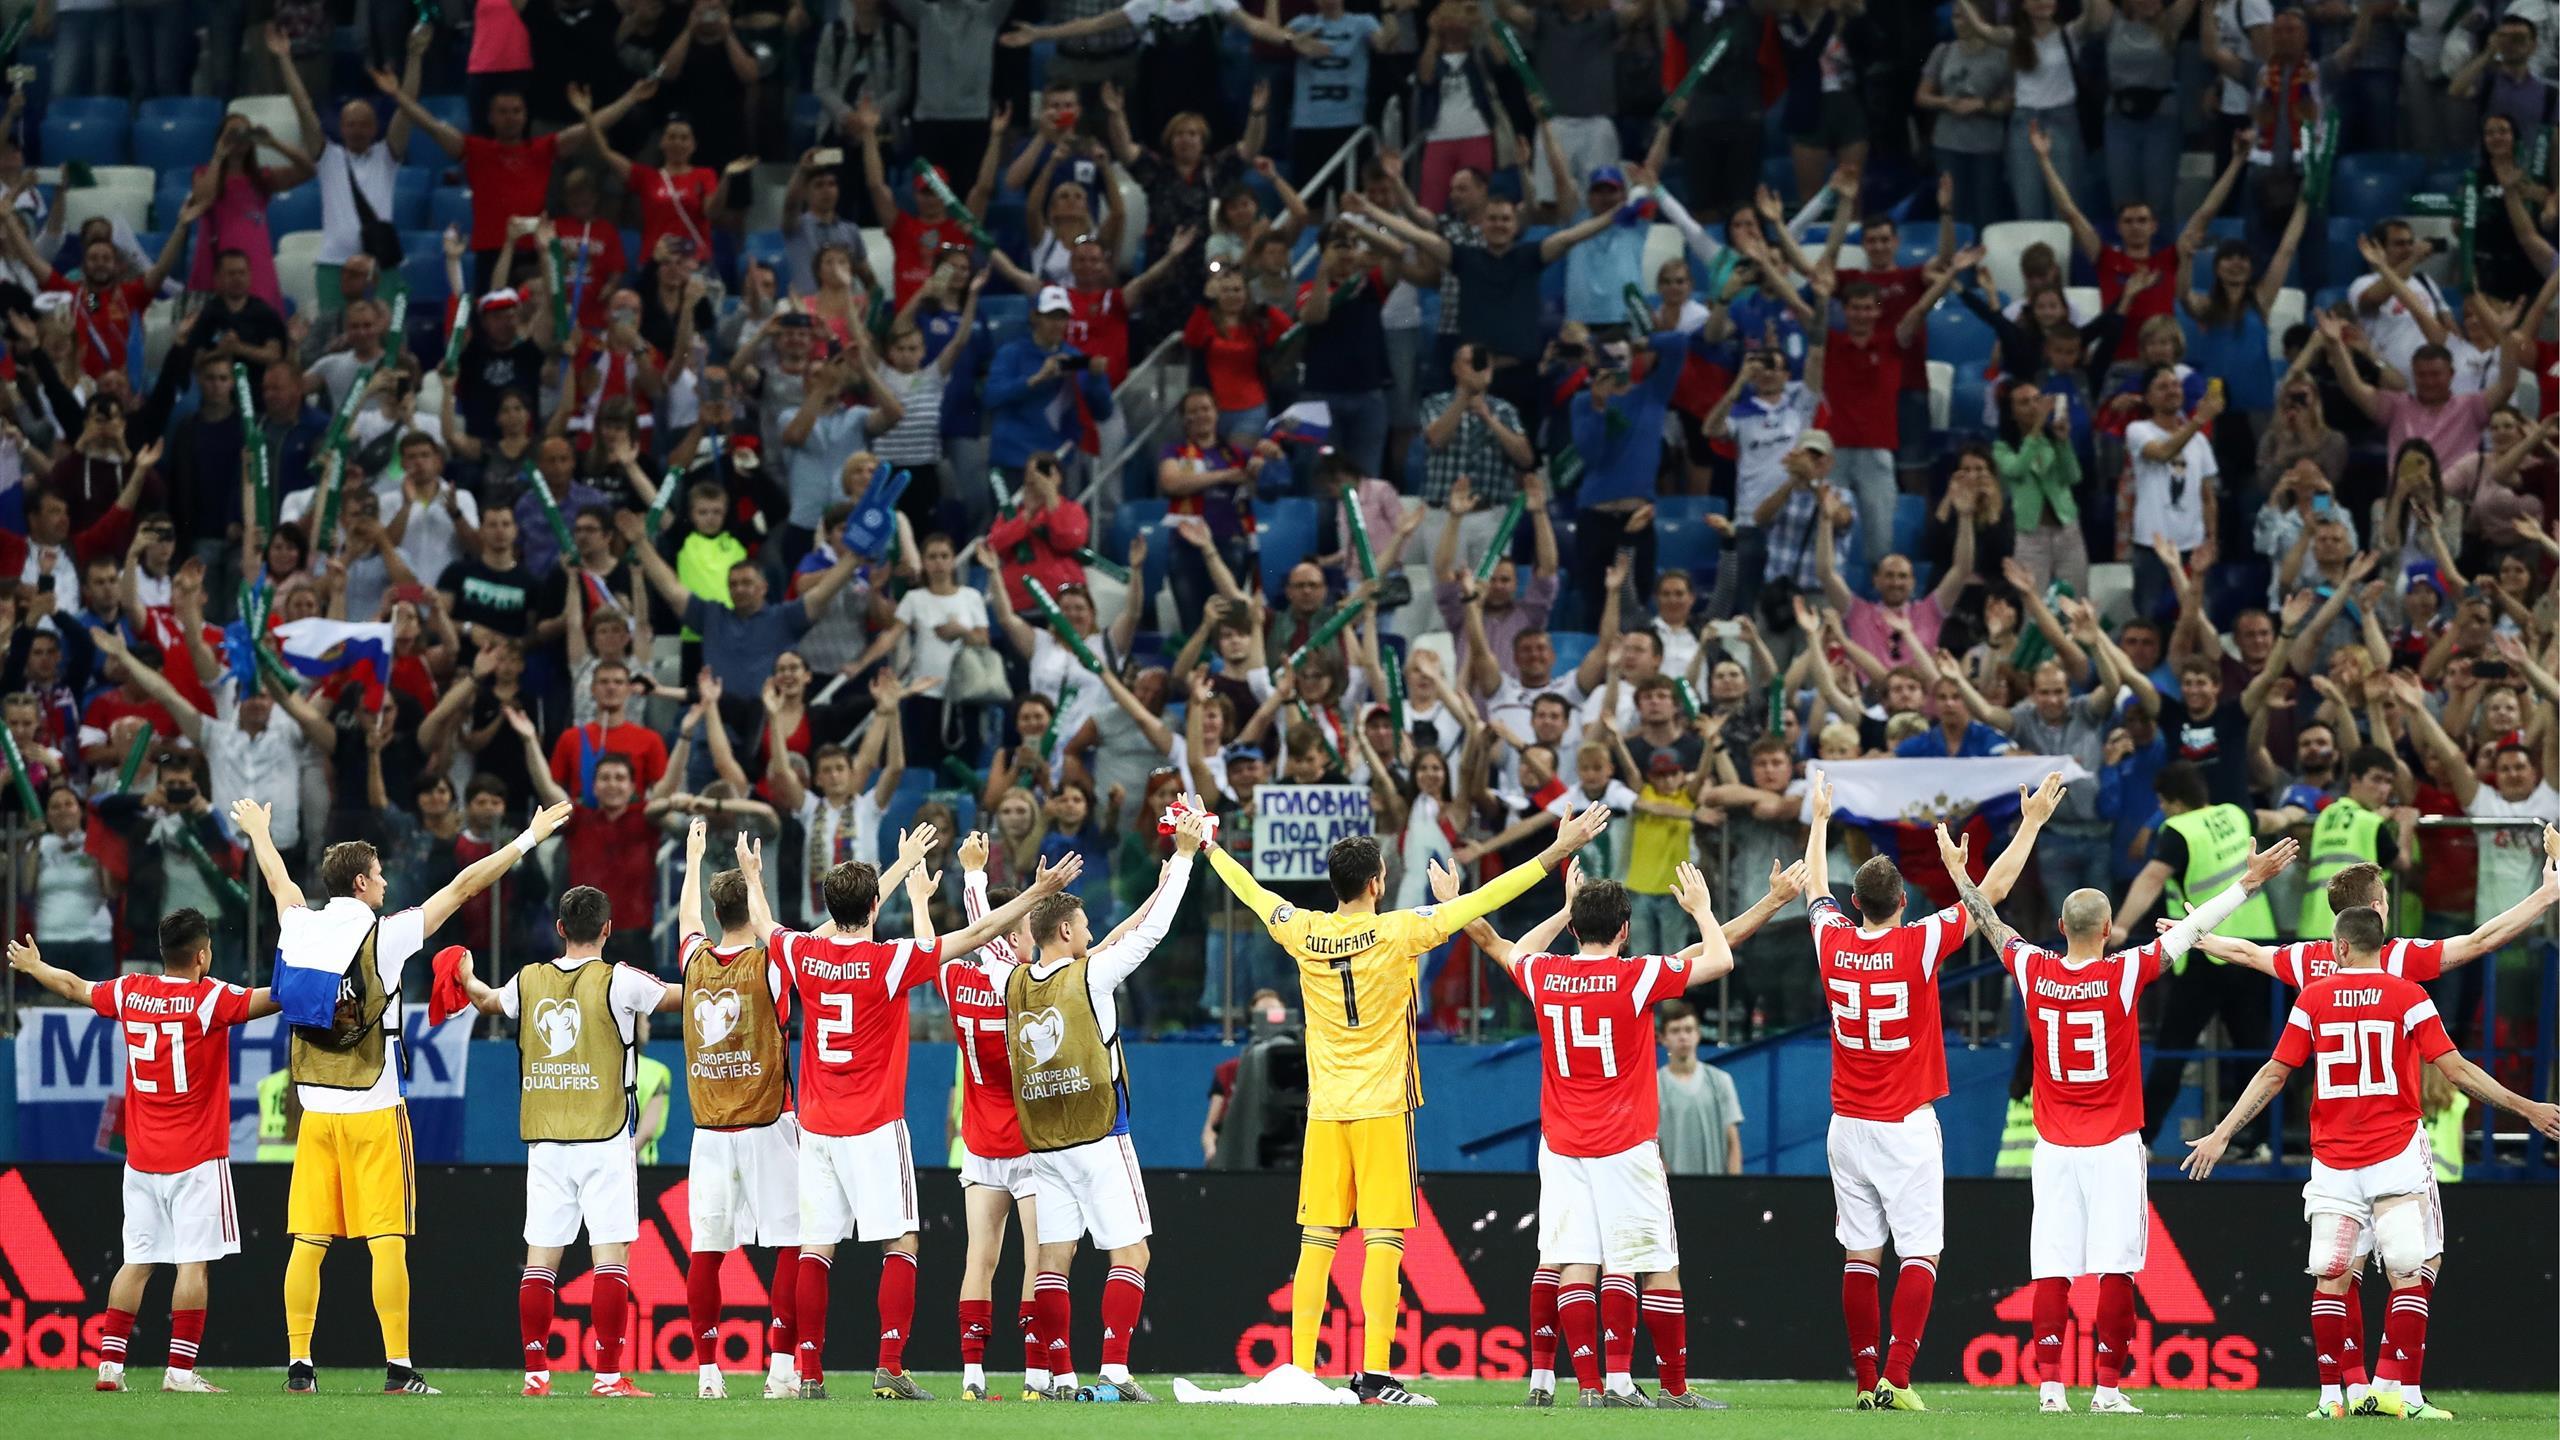 Испания россия футбол форум